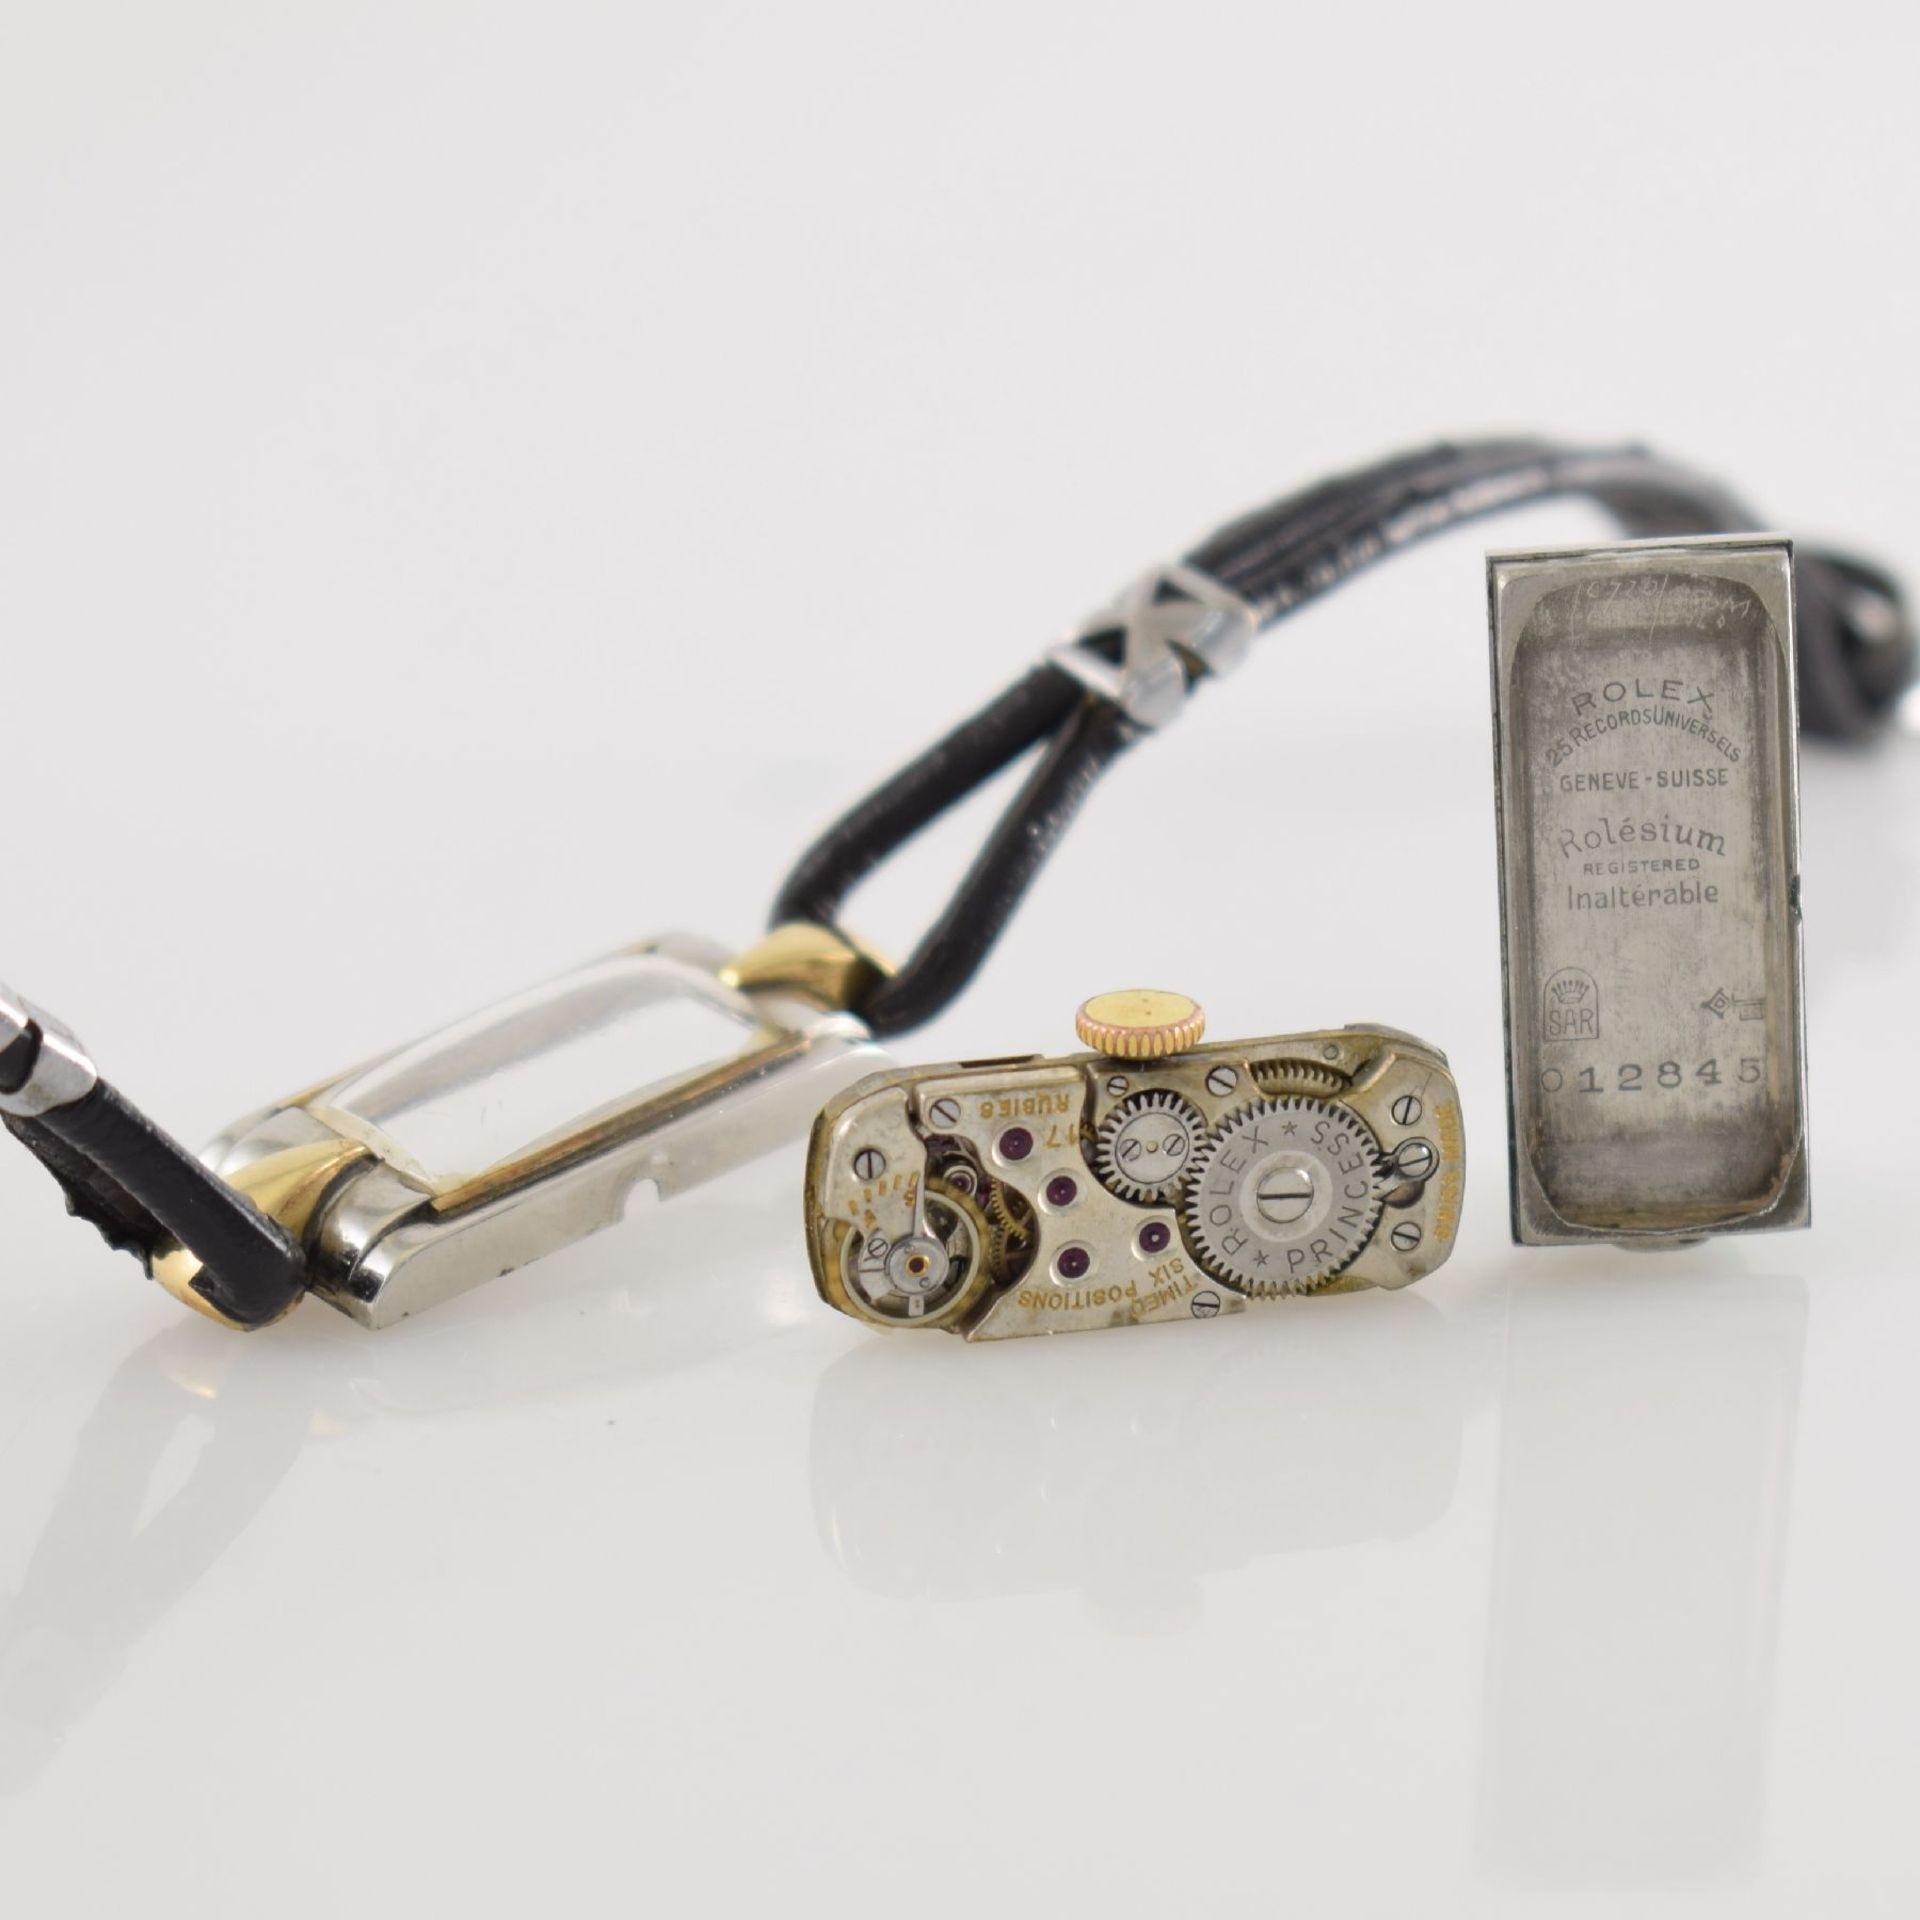 ROLEX Princess Damenarmbanduhr Ref. 1876 in Stahl/Gold, Schweiz um 1935, Handaufzug, rechteck. - Bild 8 aus 8